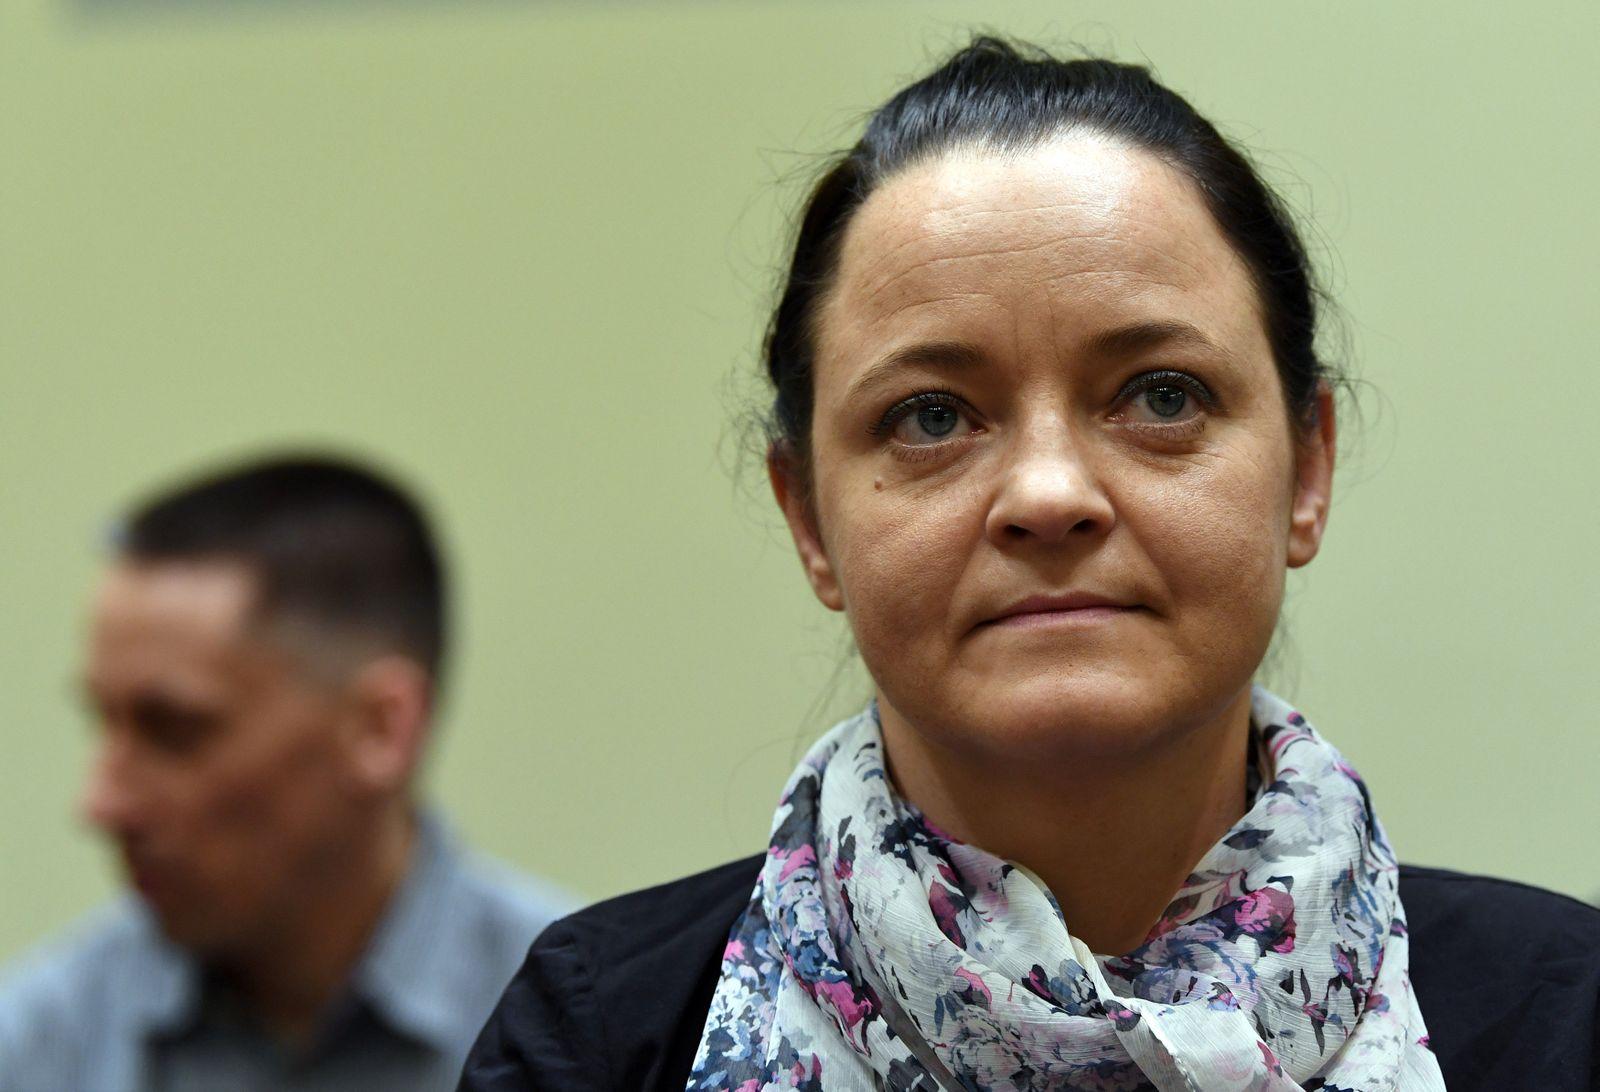 Defendant Zschaepe in a courtroom in Munich